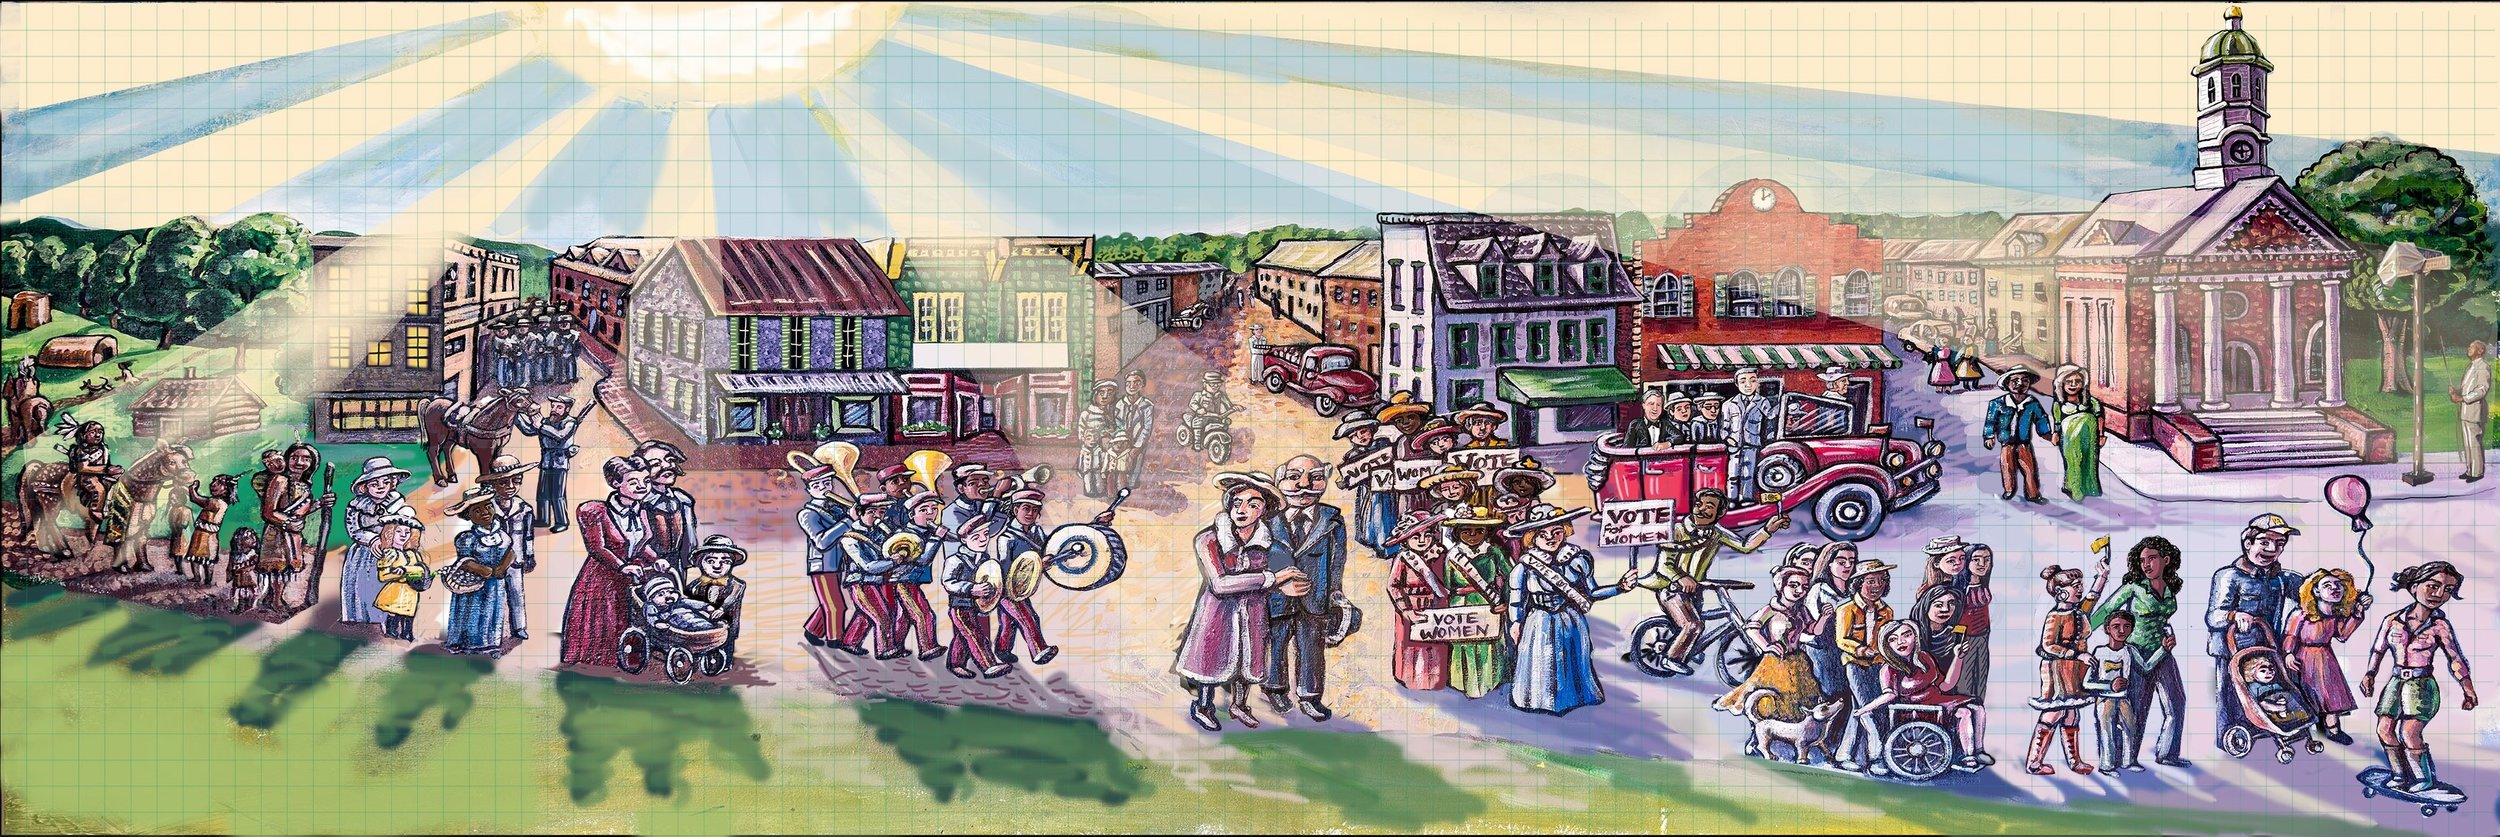 Leesburgh Historical Mural, Virgina 2015